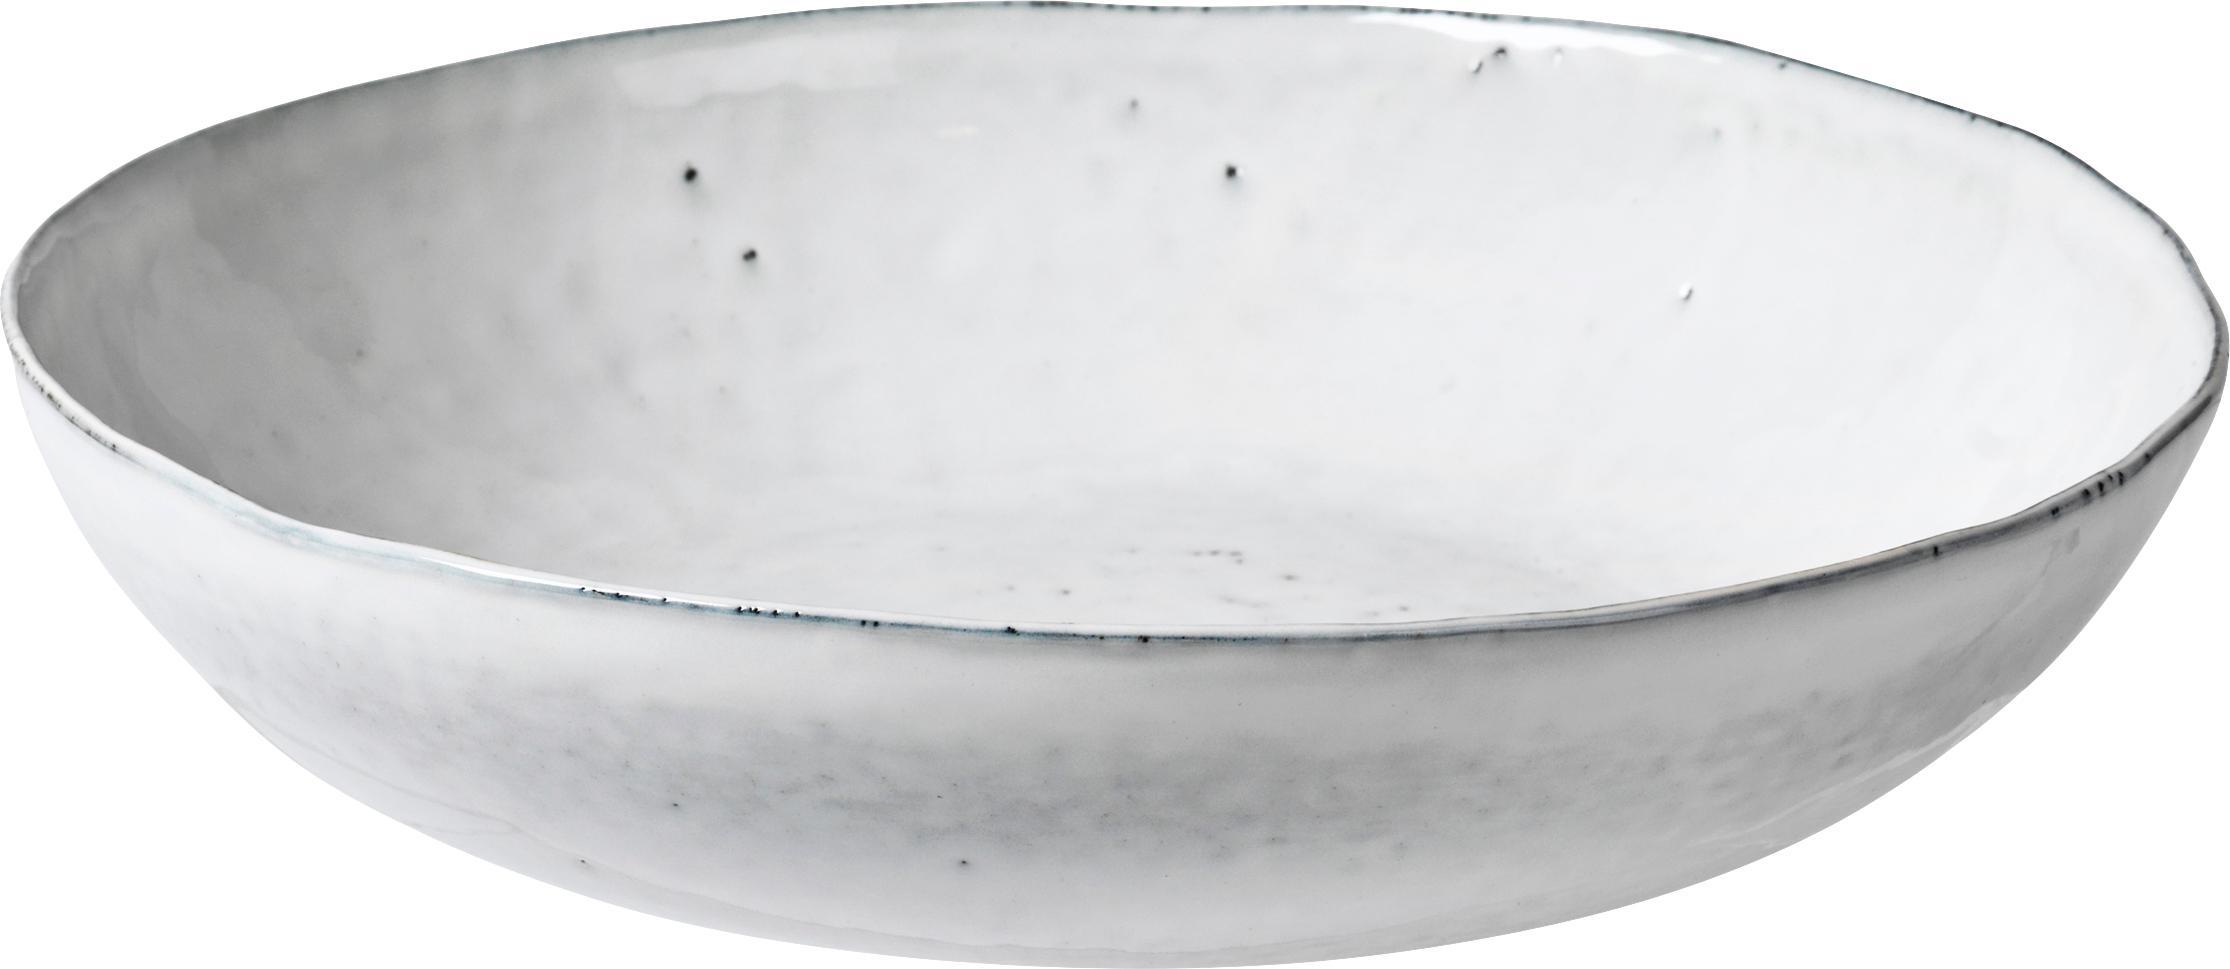 Ciotola da portata fatta a mano Nordic Sand, Terracotta, Sabbia, Ø 34 x Alt. 8 cm